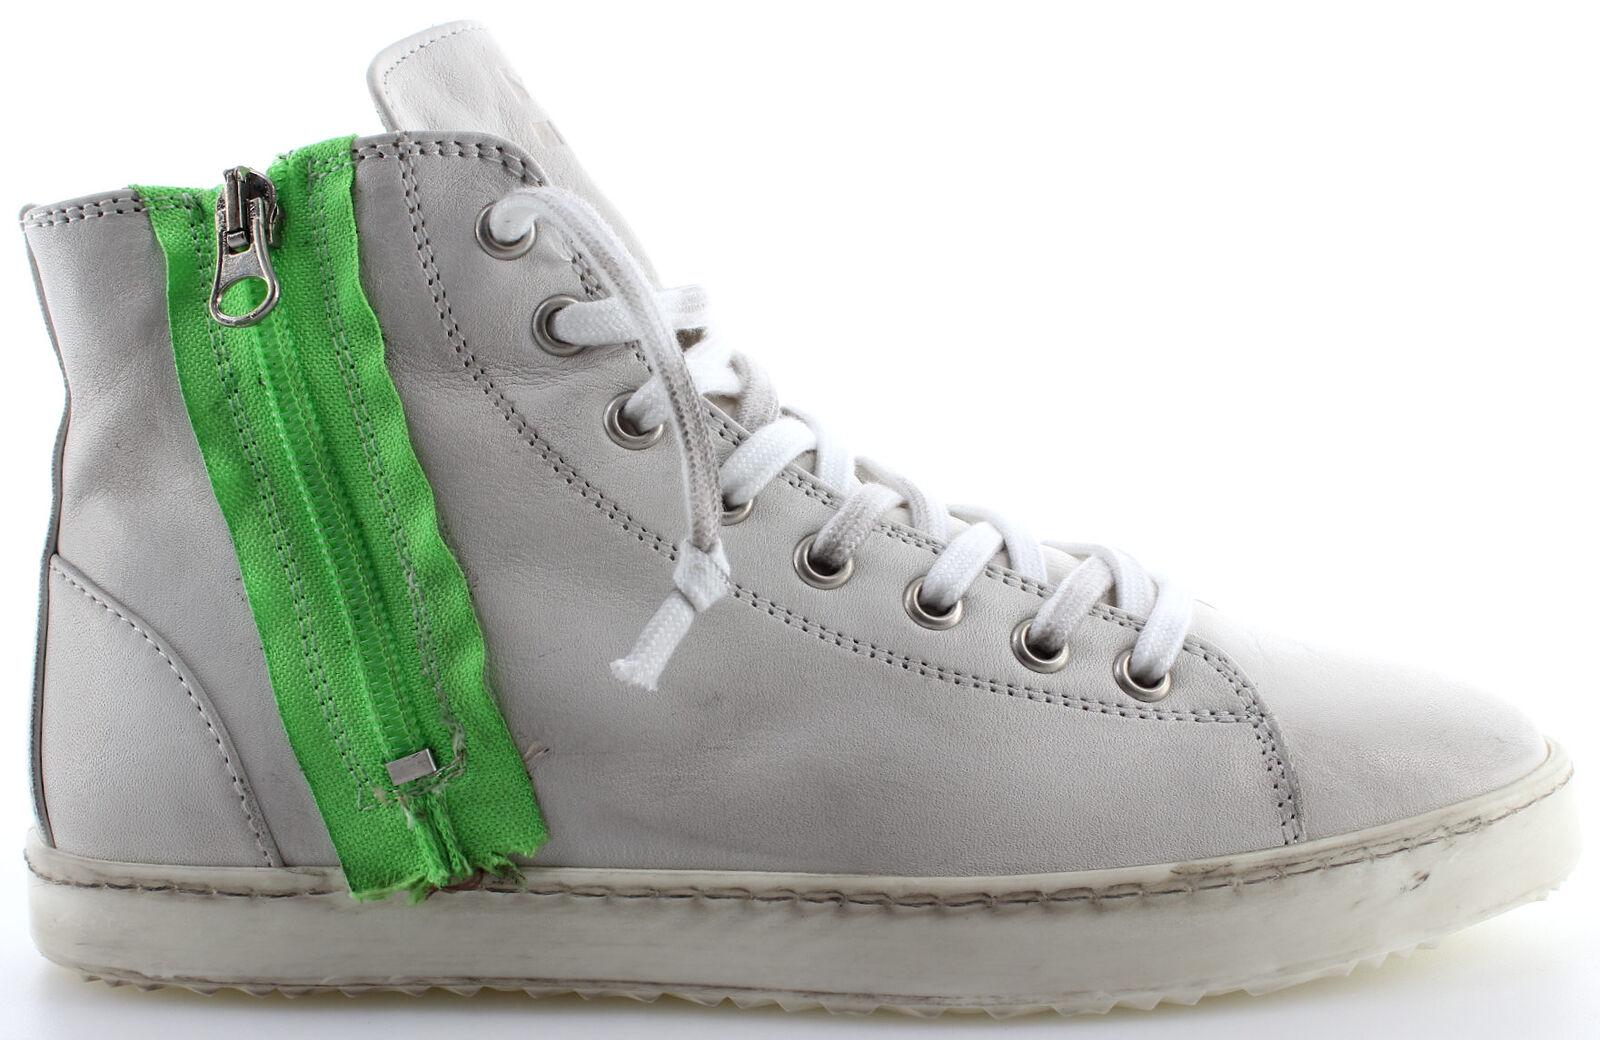 Damen Zip Schuhe Sneakers YAB Zip Damen Sauvage 1005 Verde Leder Weiss Vintage  Made  163030